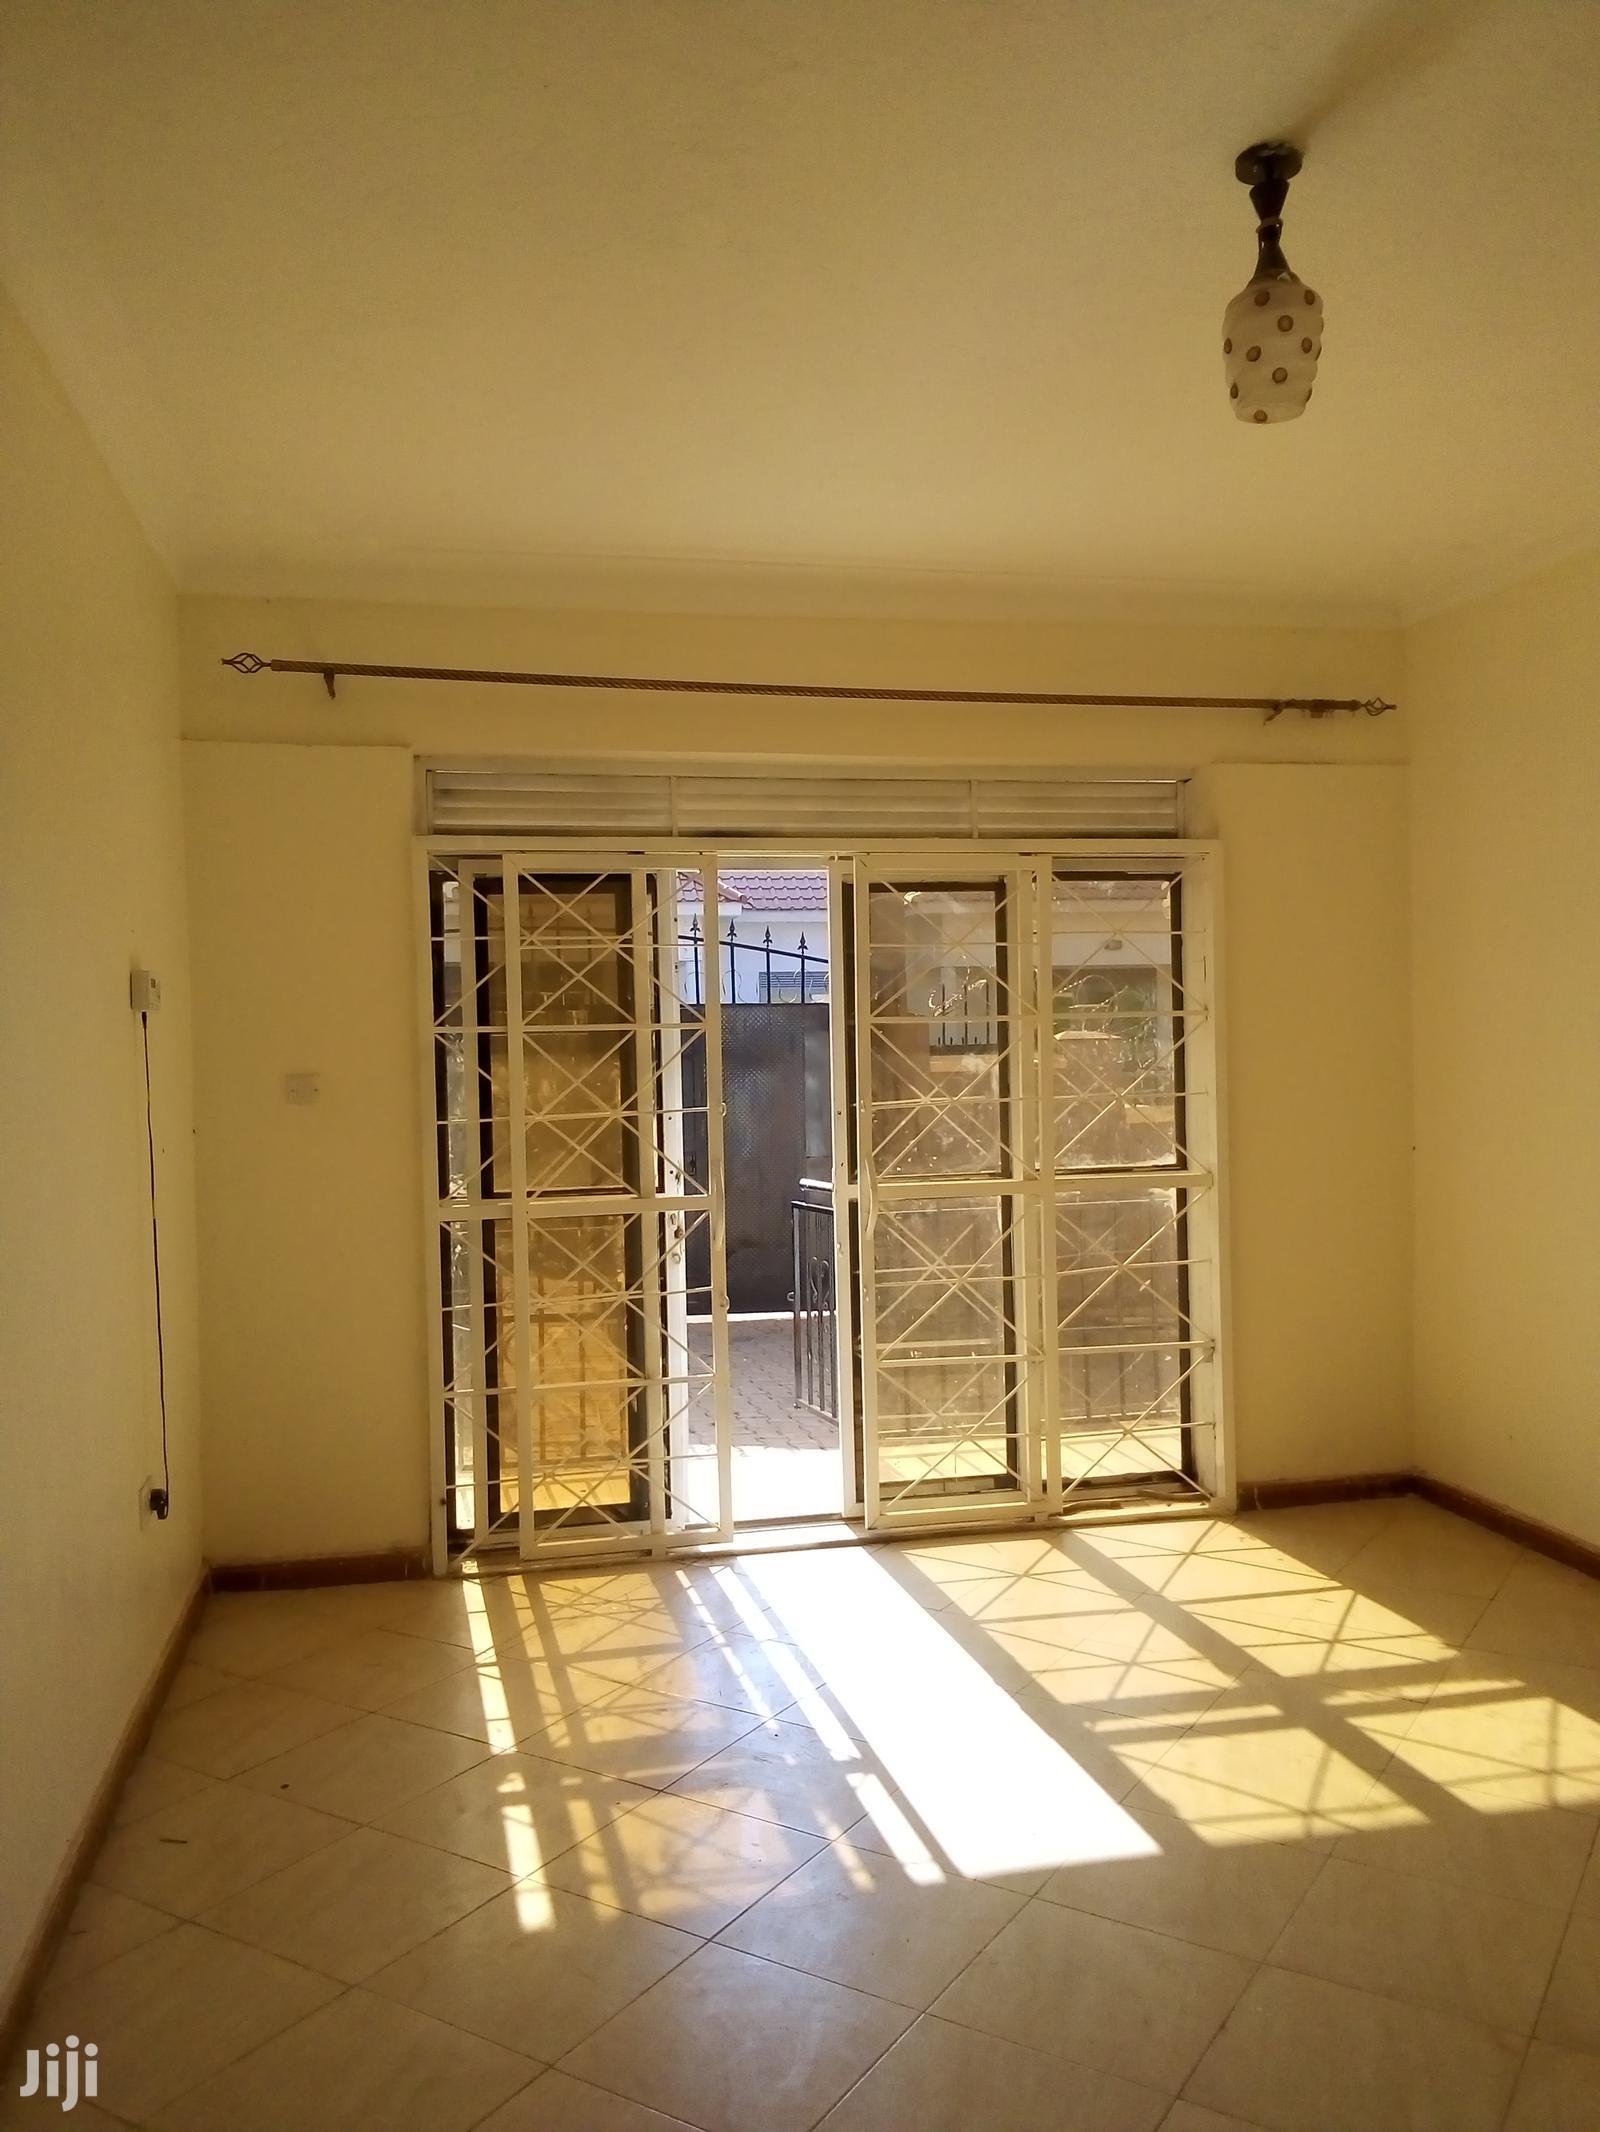 Archive: Kireka 2 Bedroom House For Rent